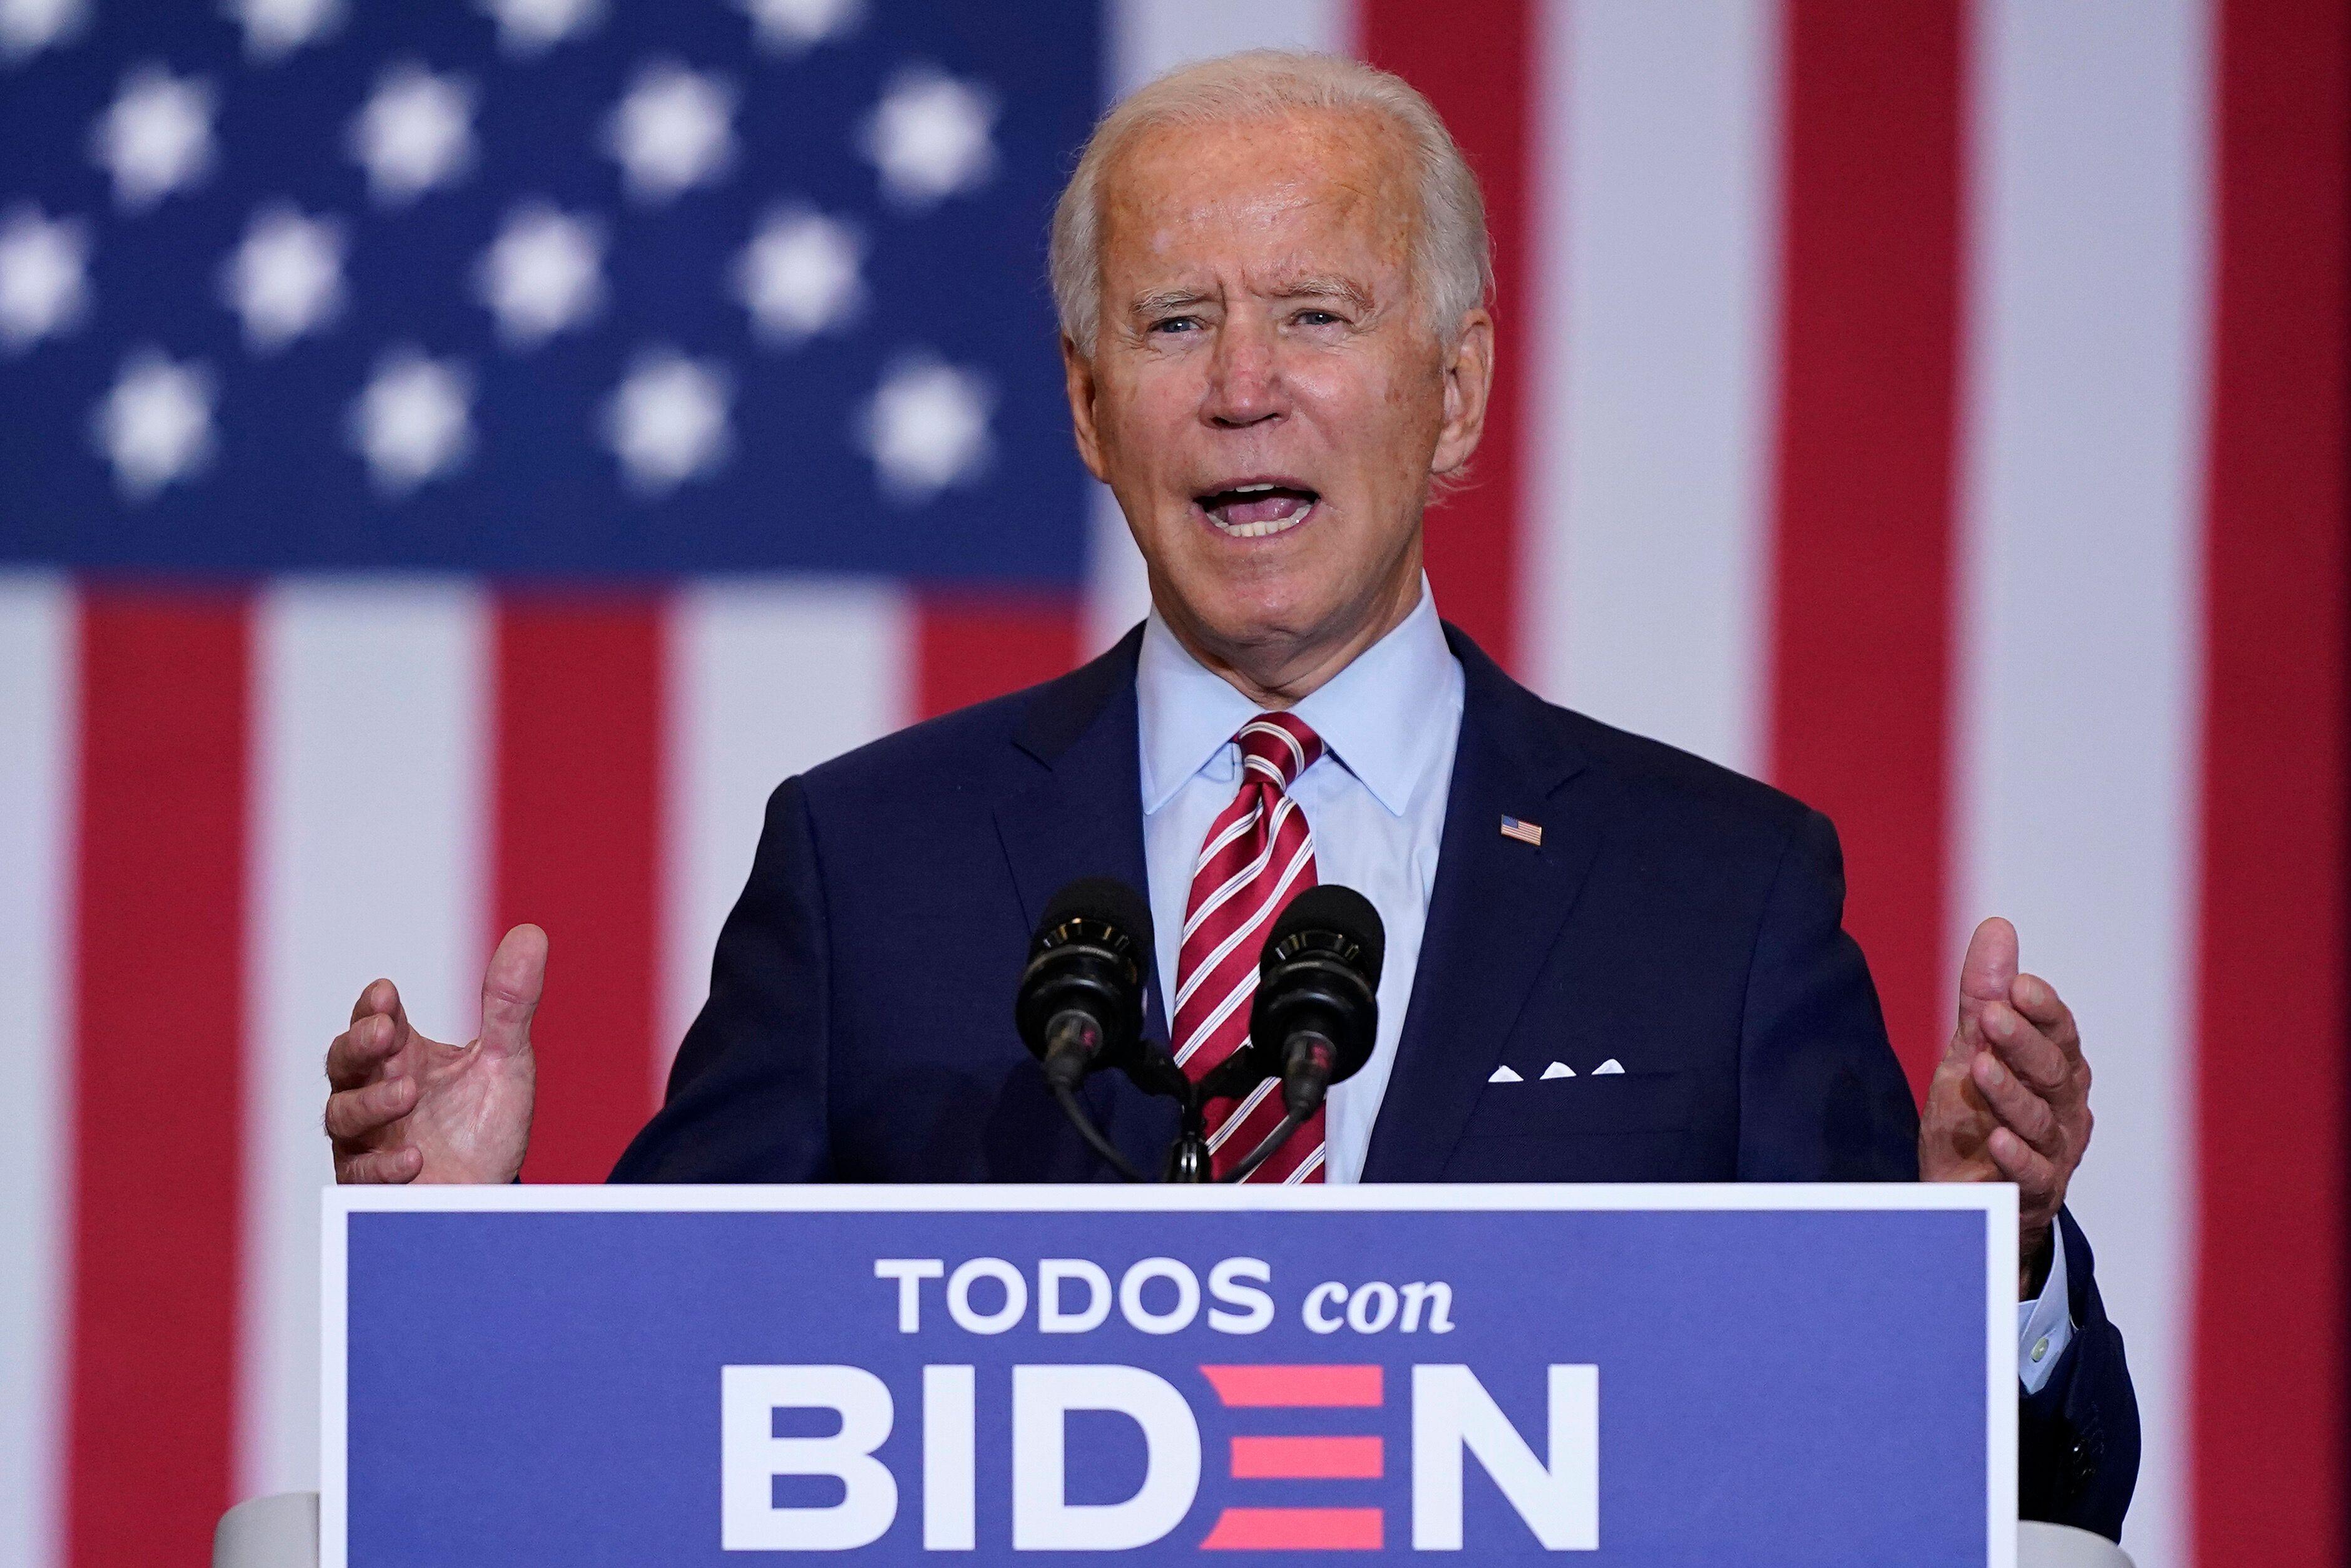 Le candidat démocrate Joe Biden, en meeting le 15 sepetmbre 2020 àOsceola Heritage...